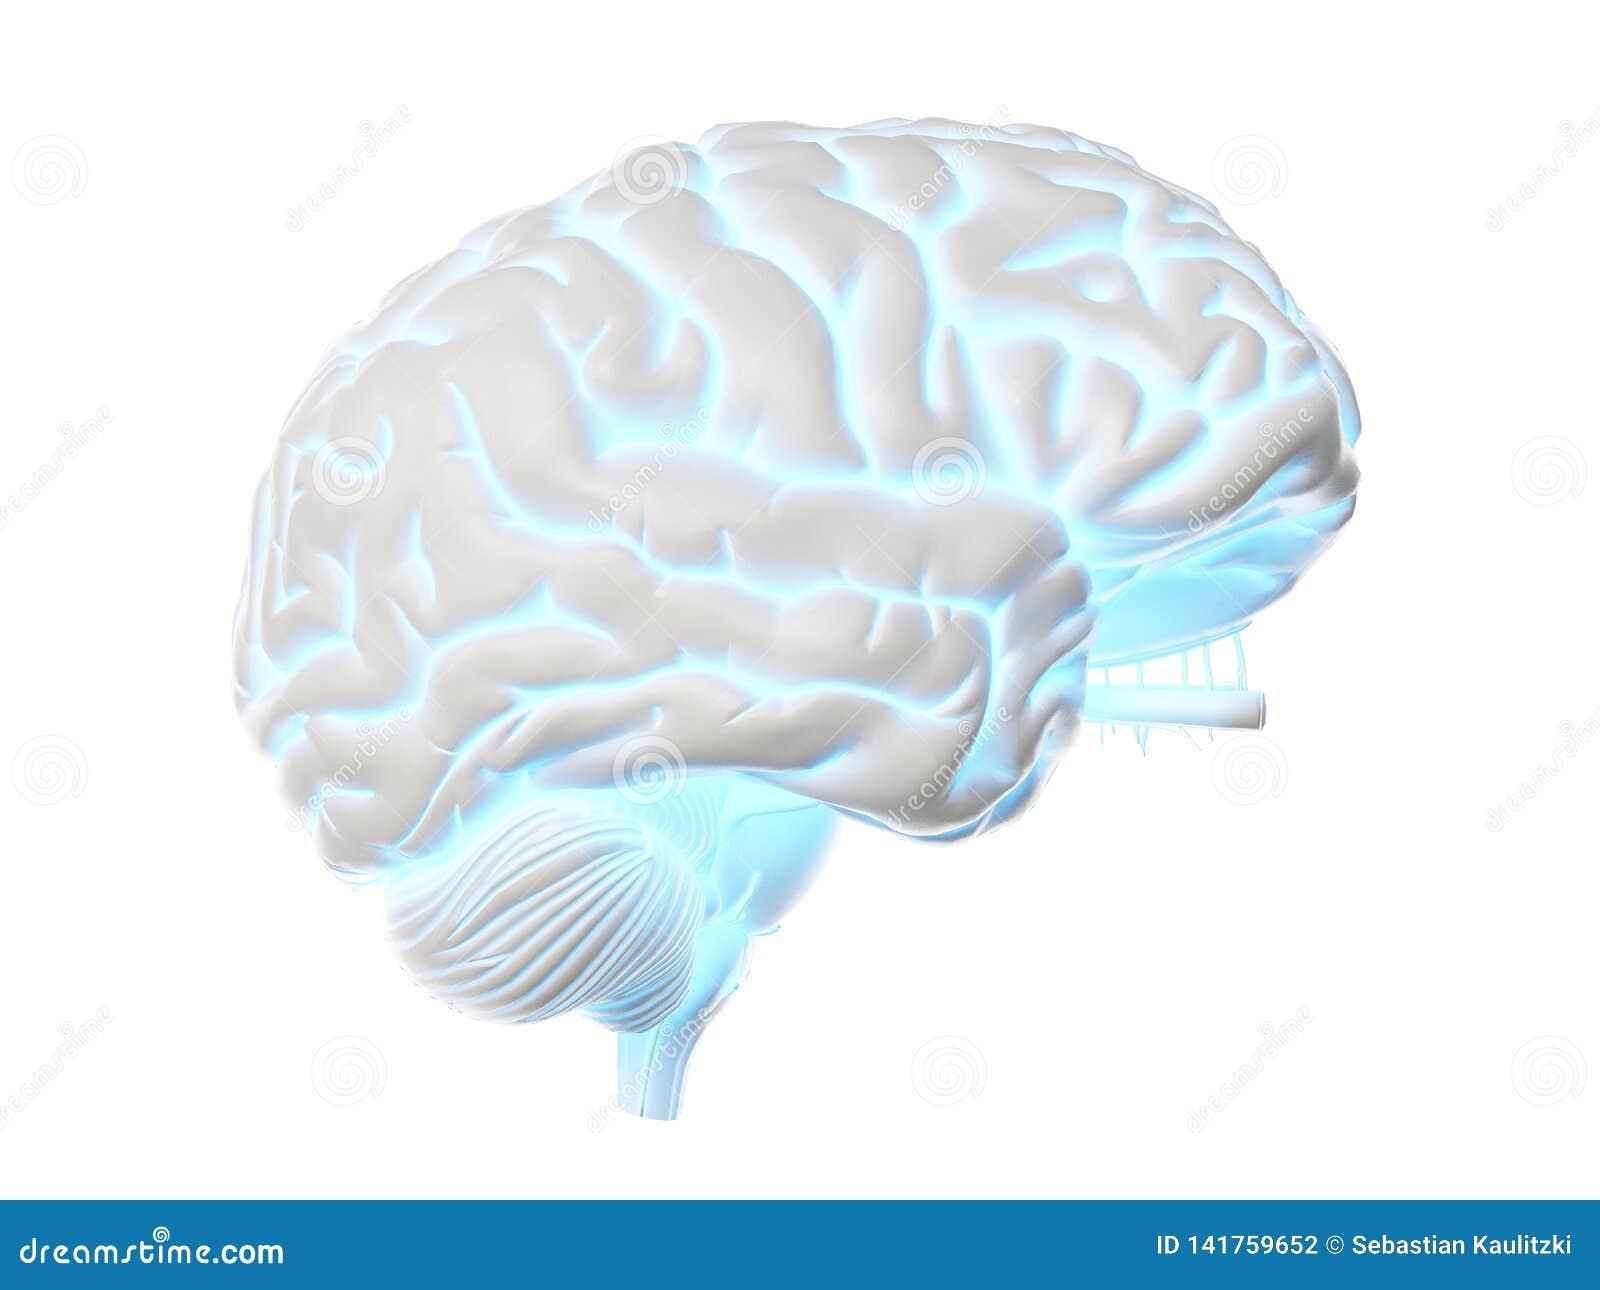 A glowing brain